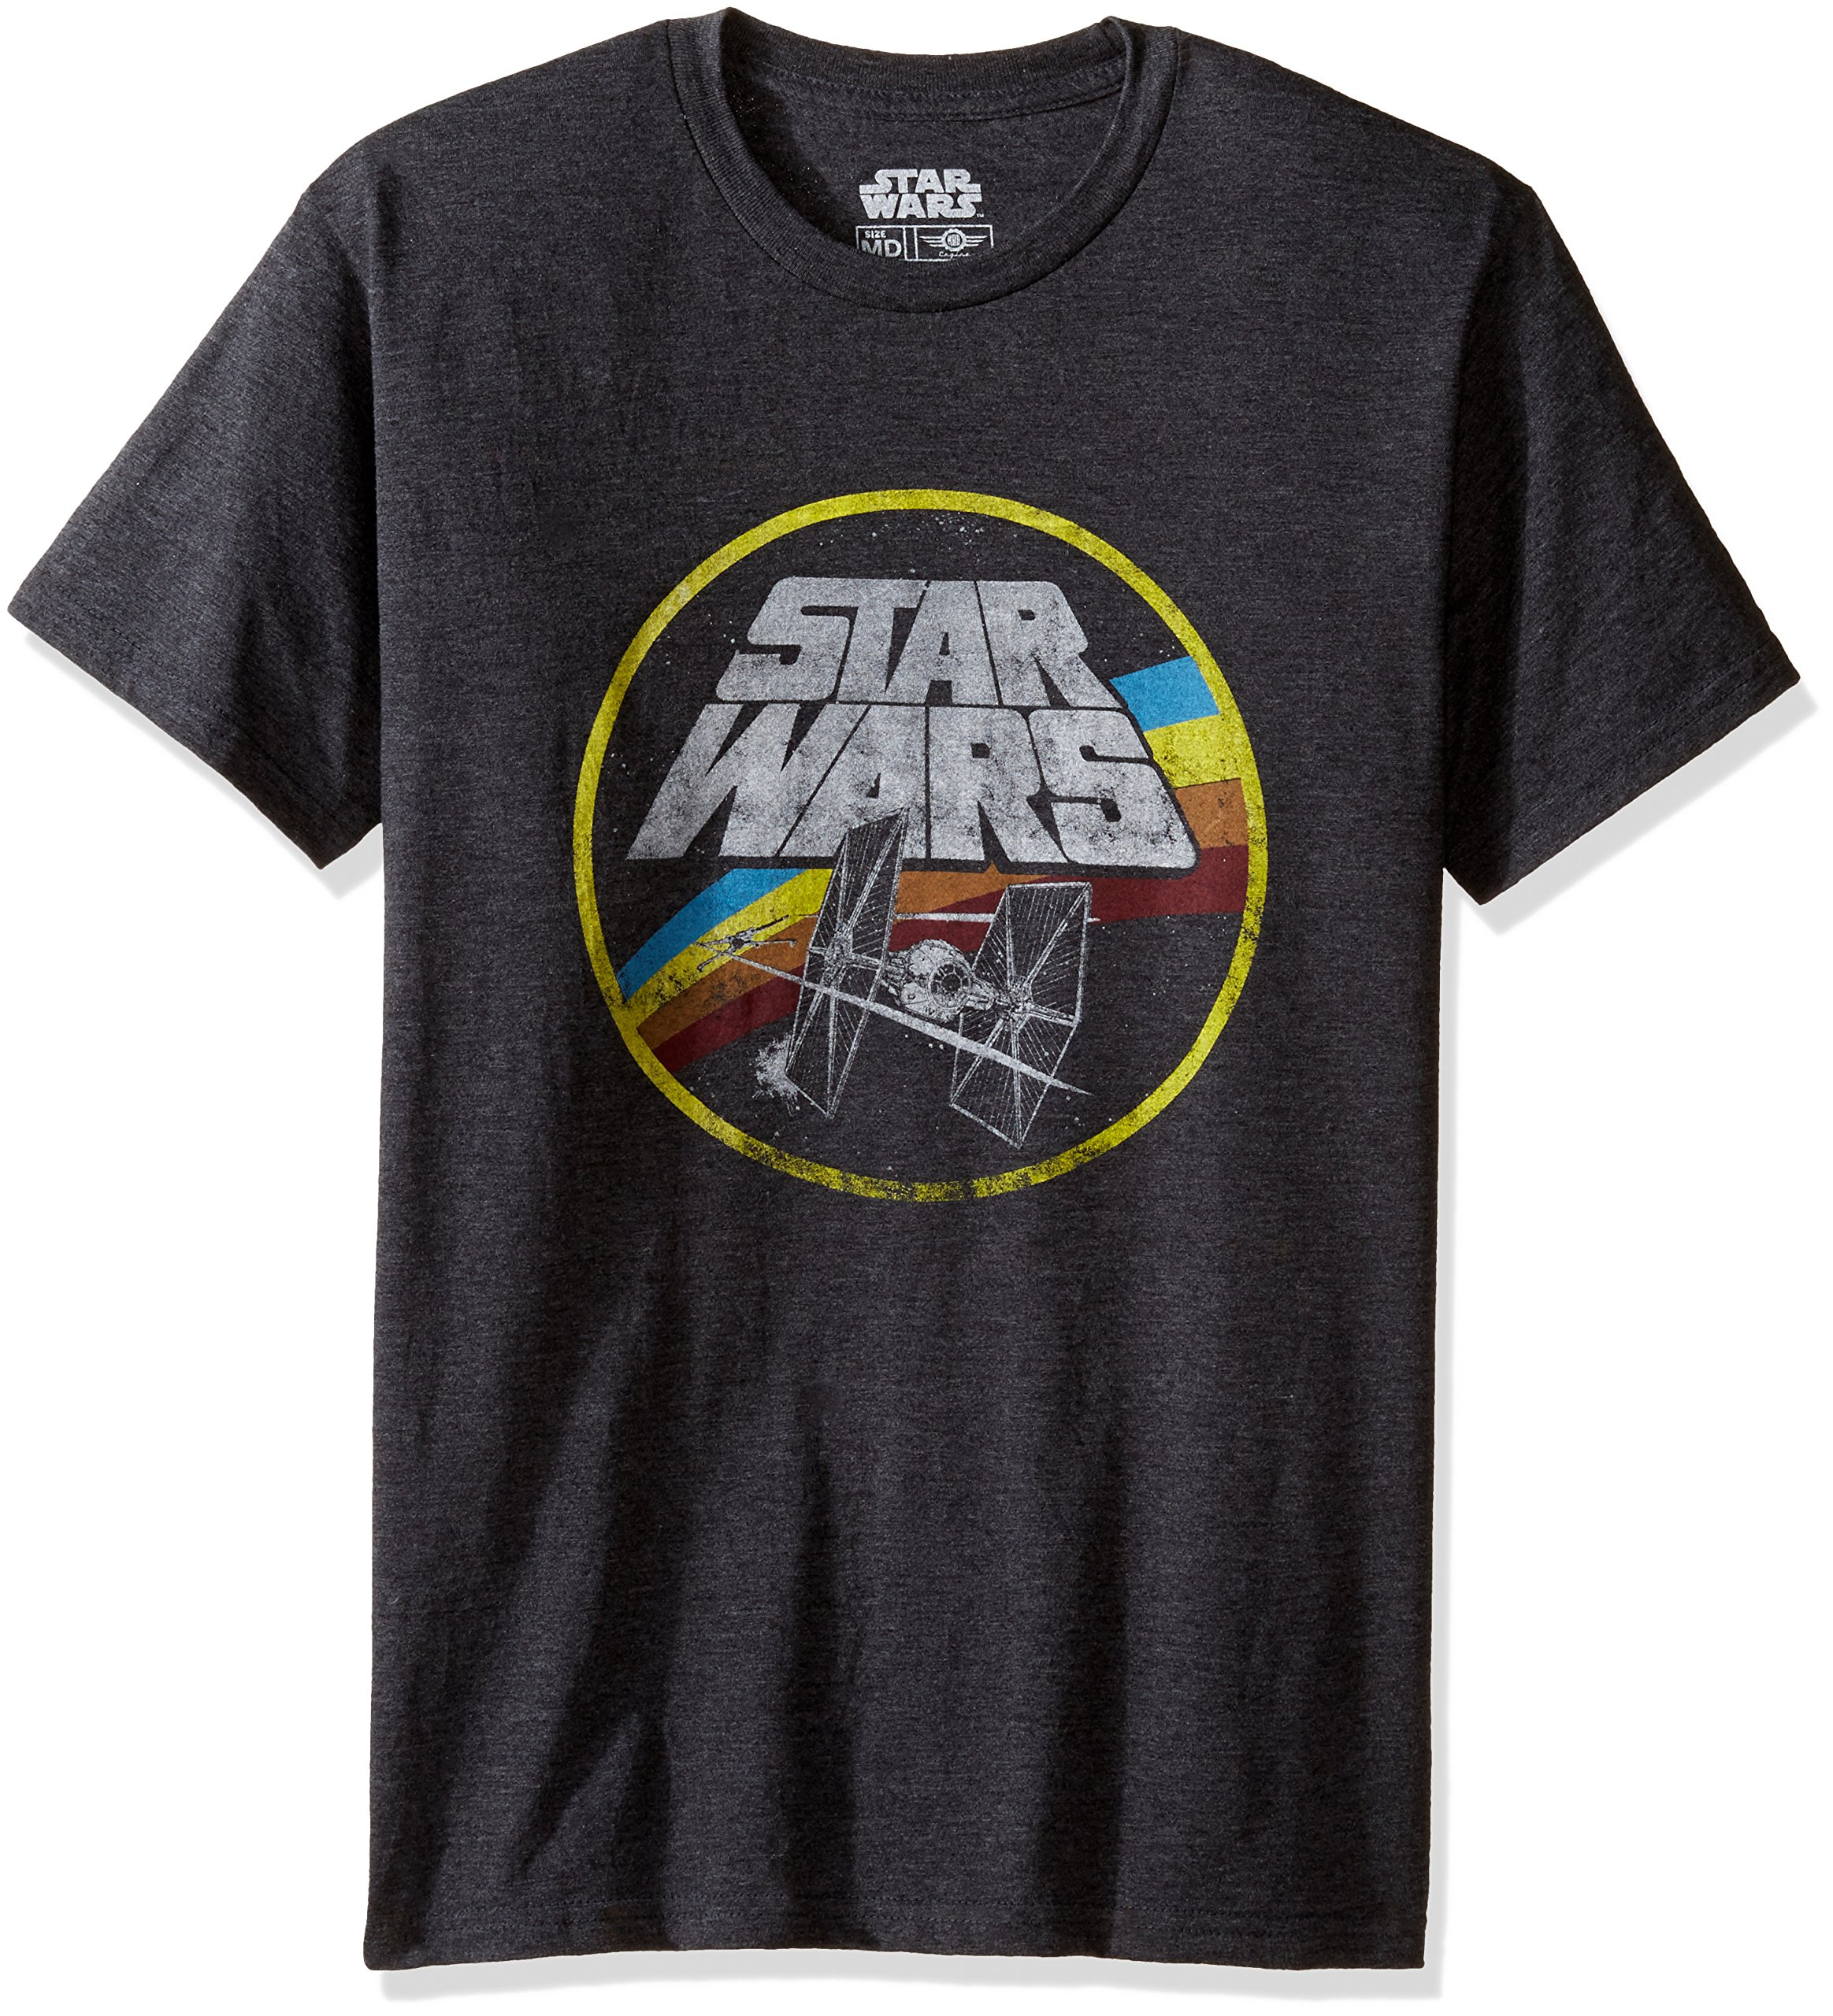 Star Wars Men's Circle Fight Short Sleeve T-Shirt, Charcoal Heather, Medium